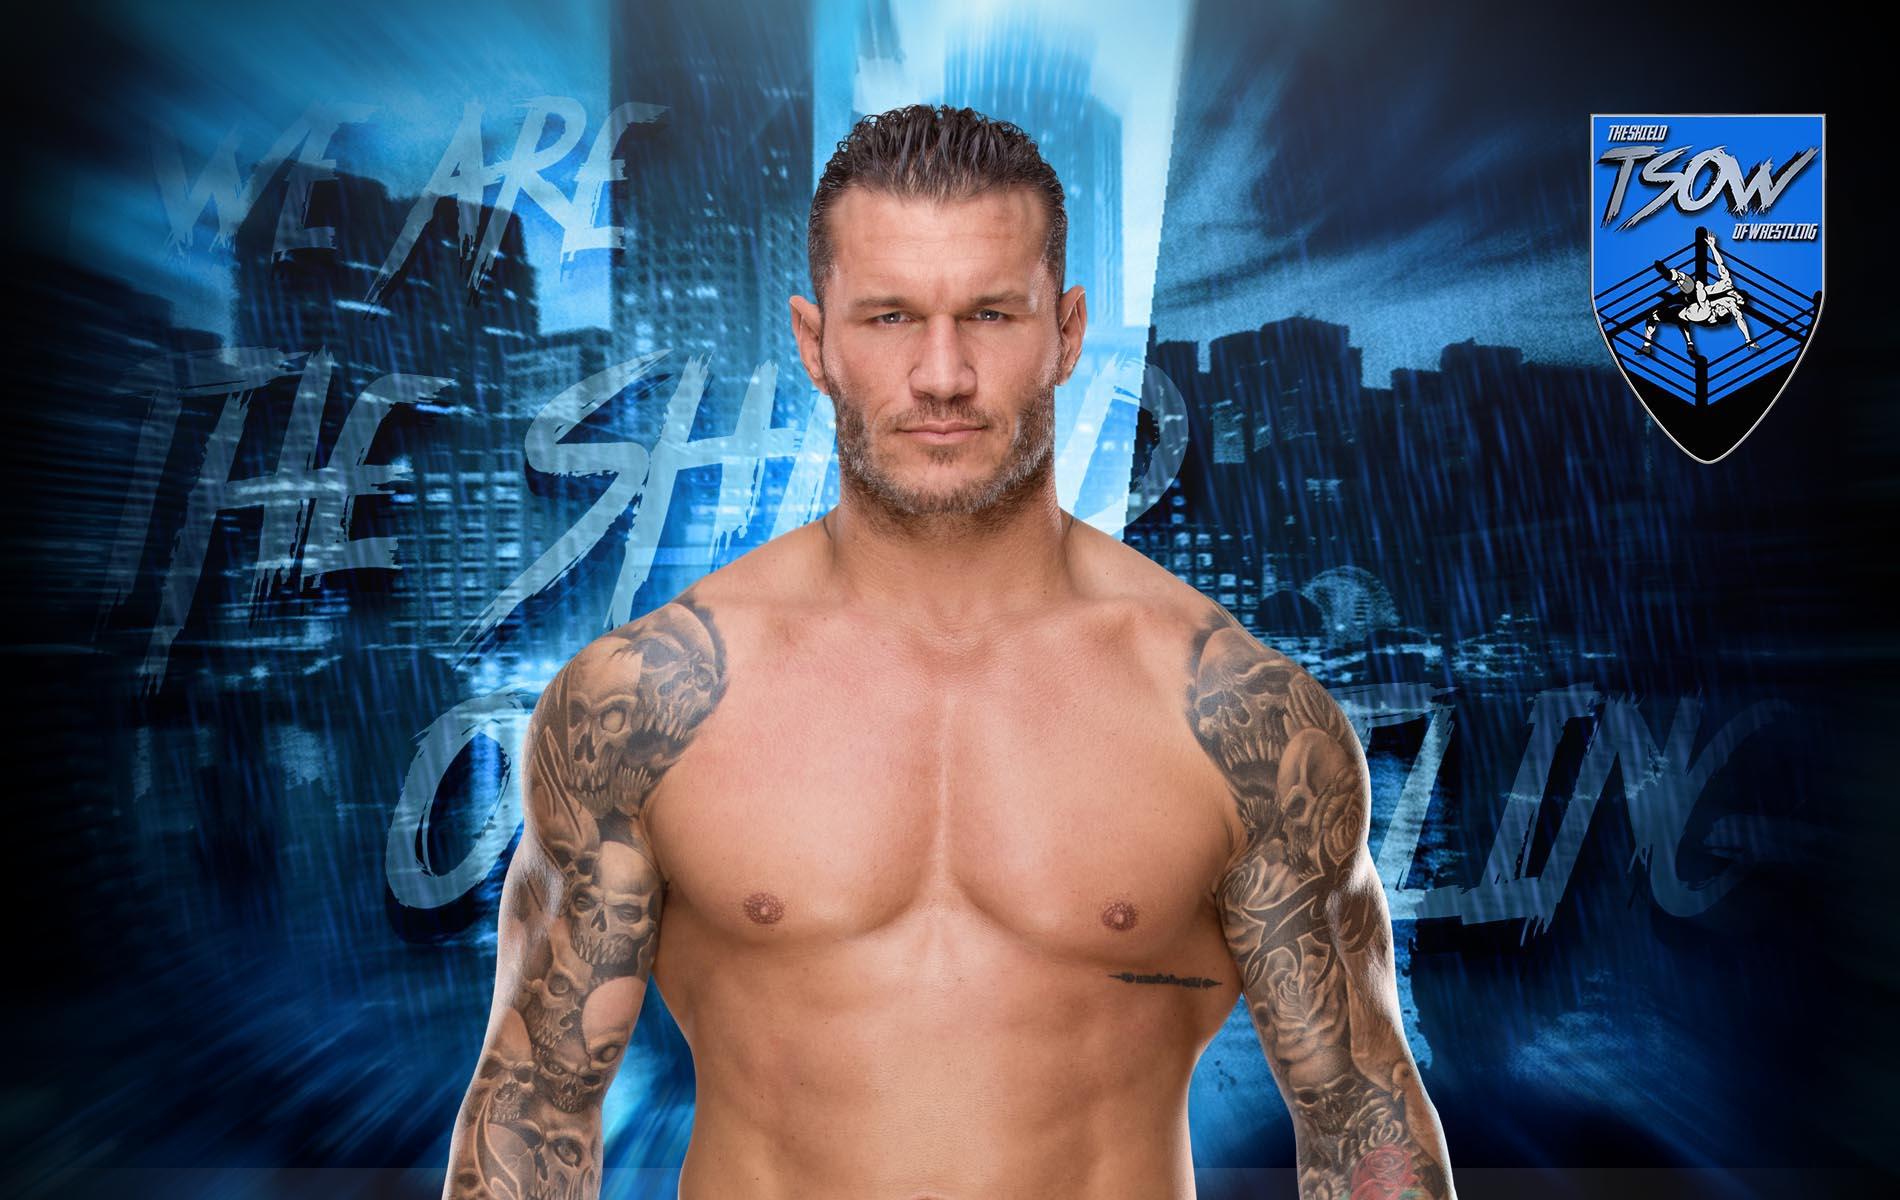 Randy Orton ricorda un controverso segmento con Rey Mysterio